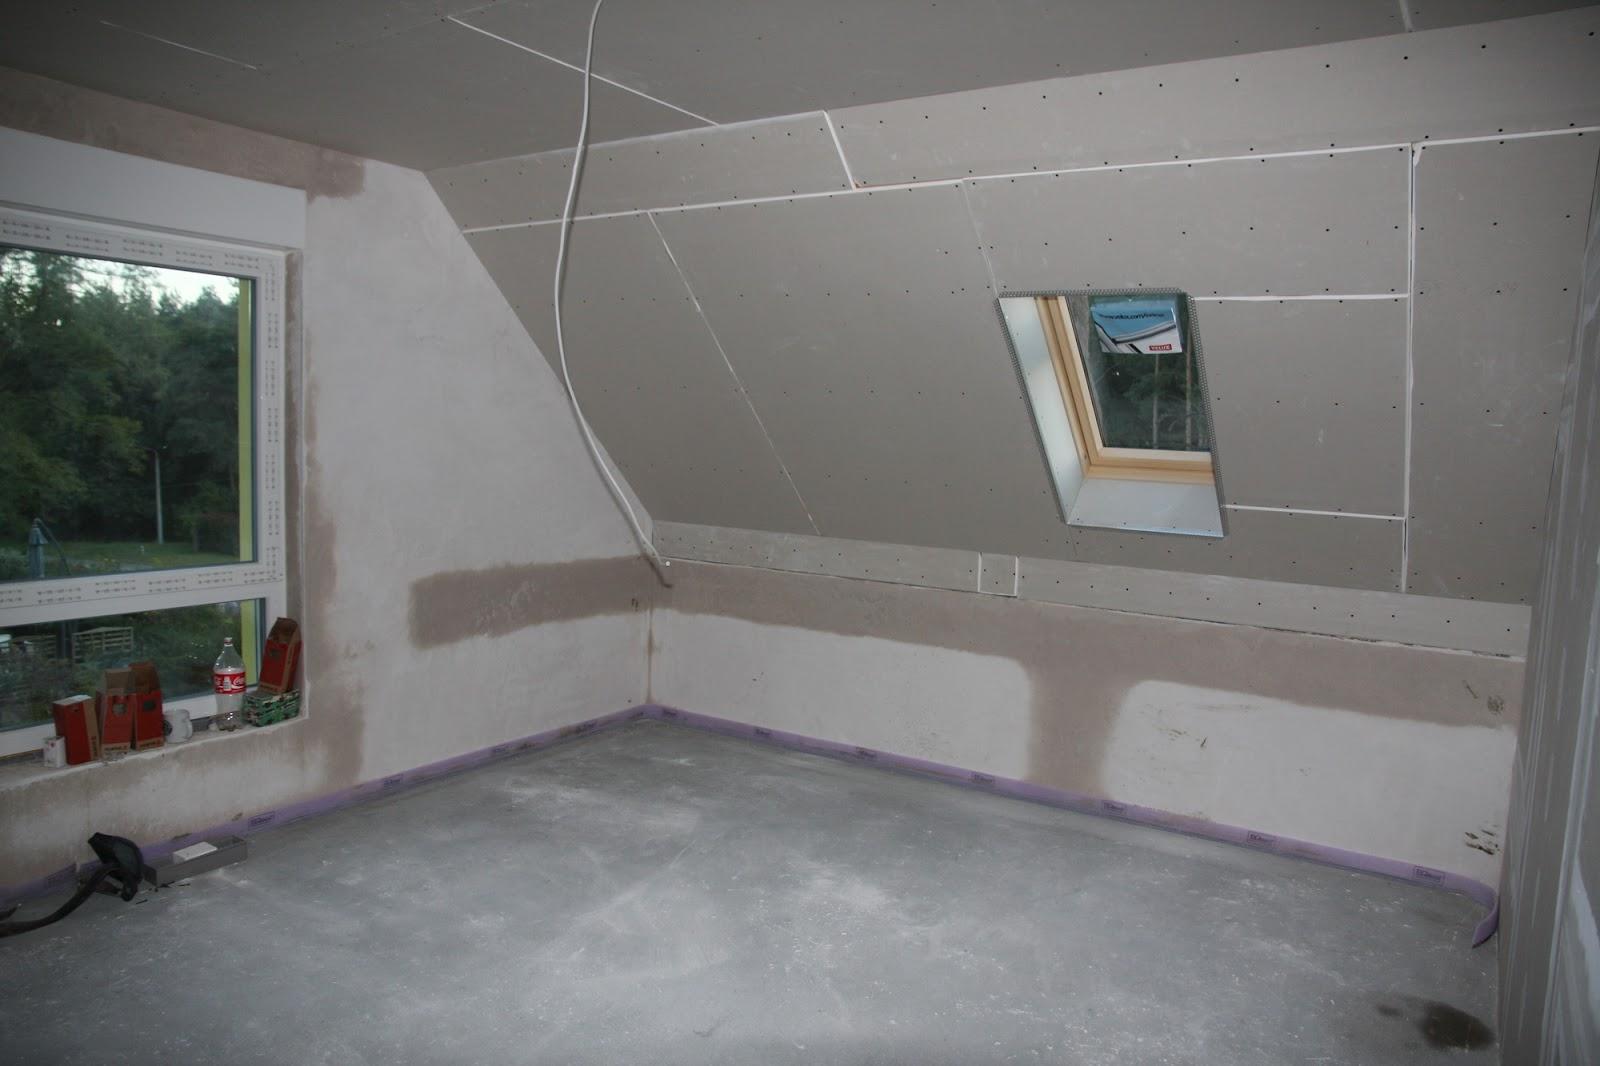 trockenbau fenster verkleiden best badewanne verkleiden holzoptik with trockenbau fenster. Black Bedroom Furniture Sets. Home Design Ideas